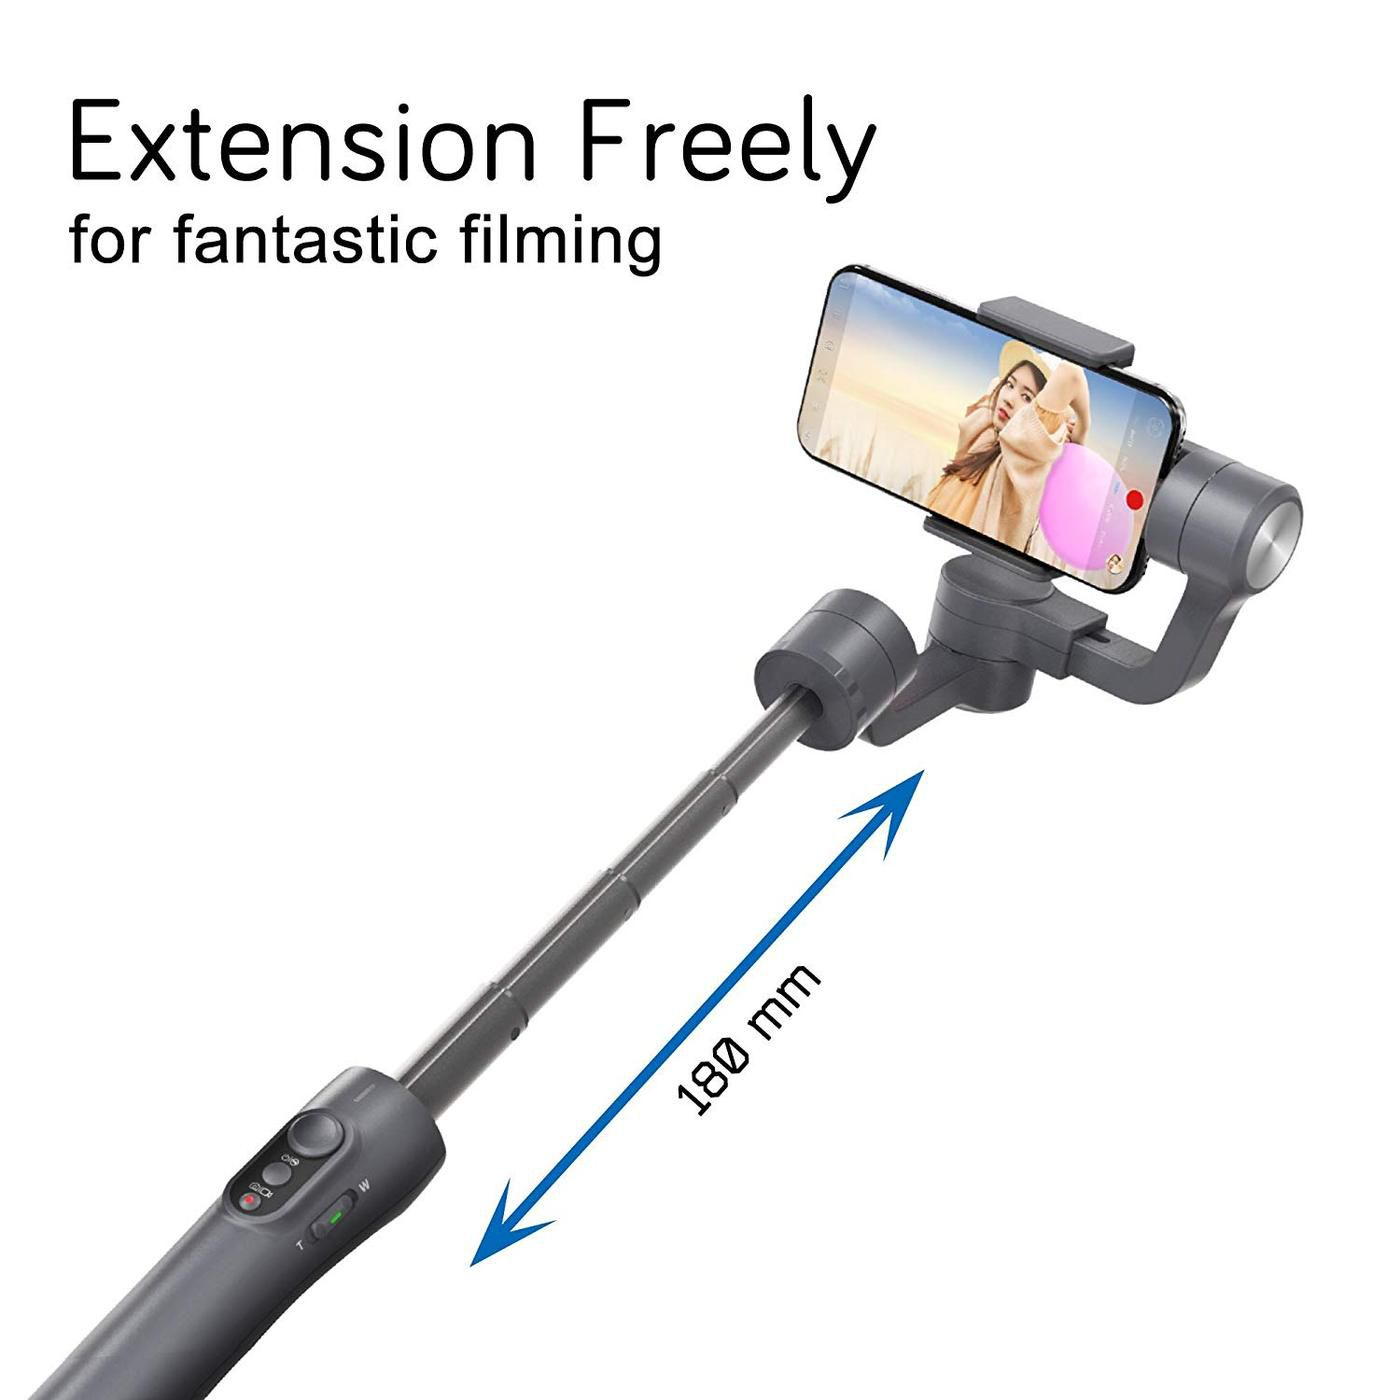 Estabilizador Eletrônico de Imagem e Vídeo Modelo Vimble 2 - Feiyutech